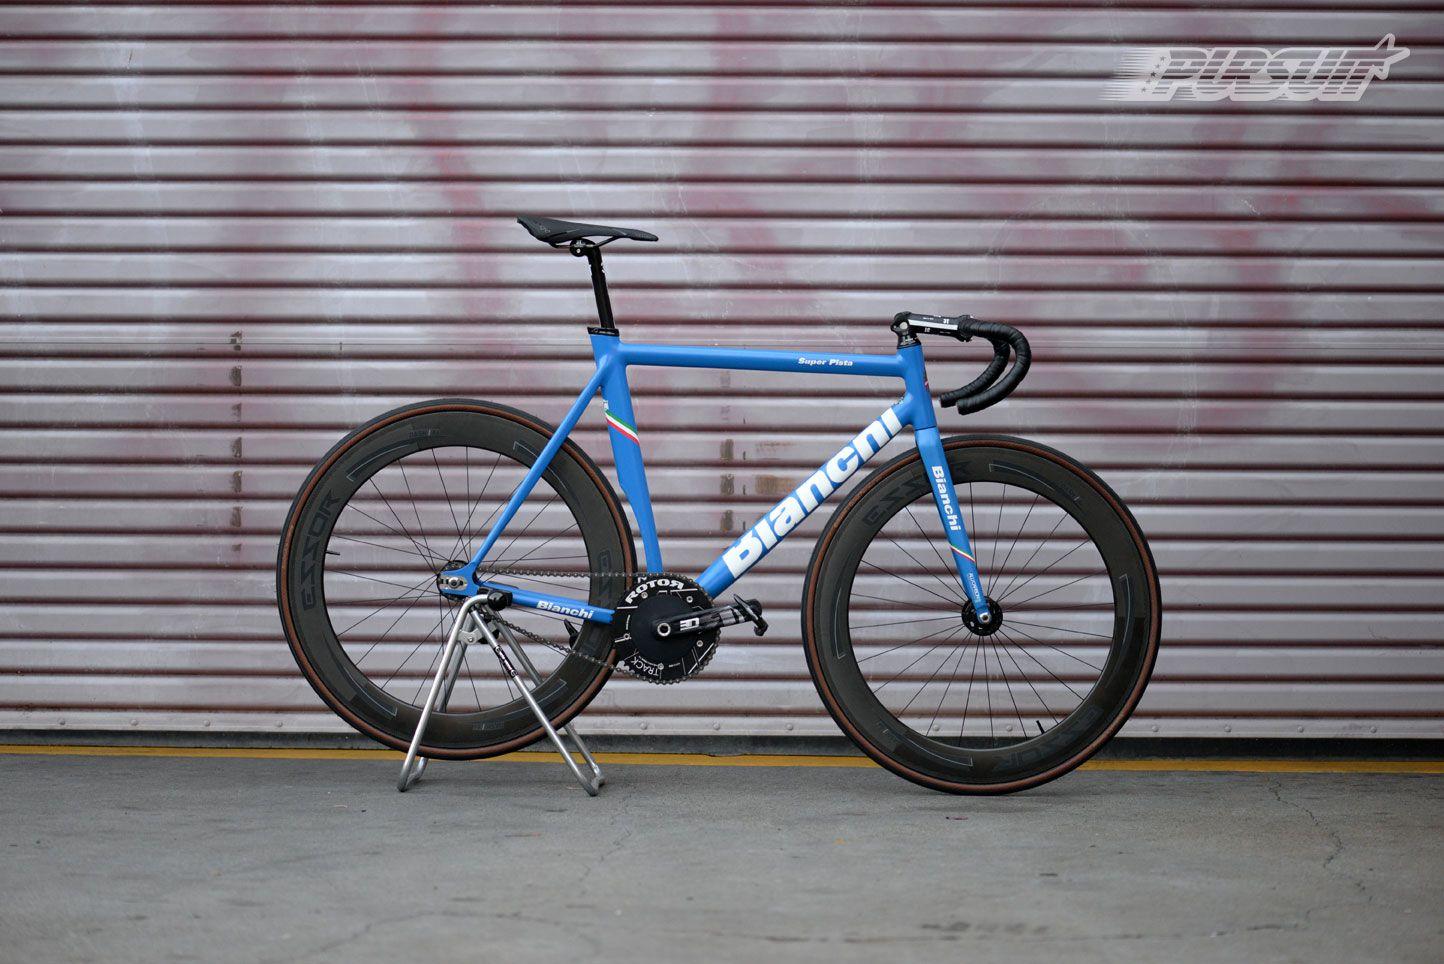 Pursuit Bicycles - Azzurro Blue Bianchi Super Pista